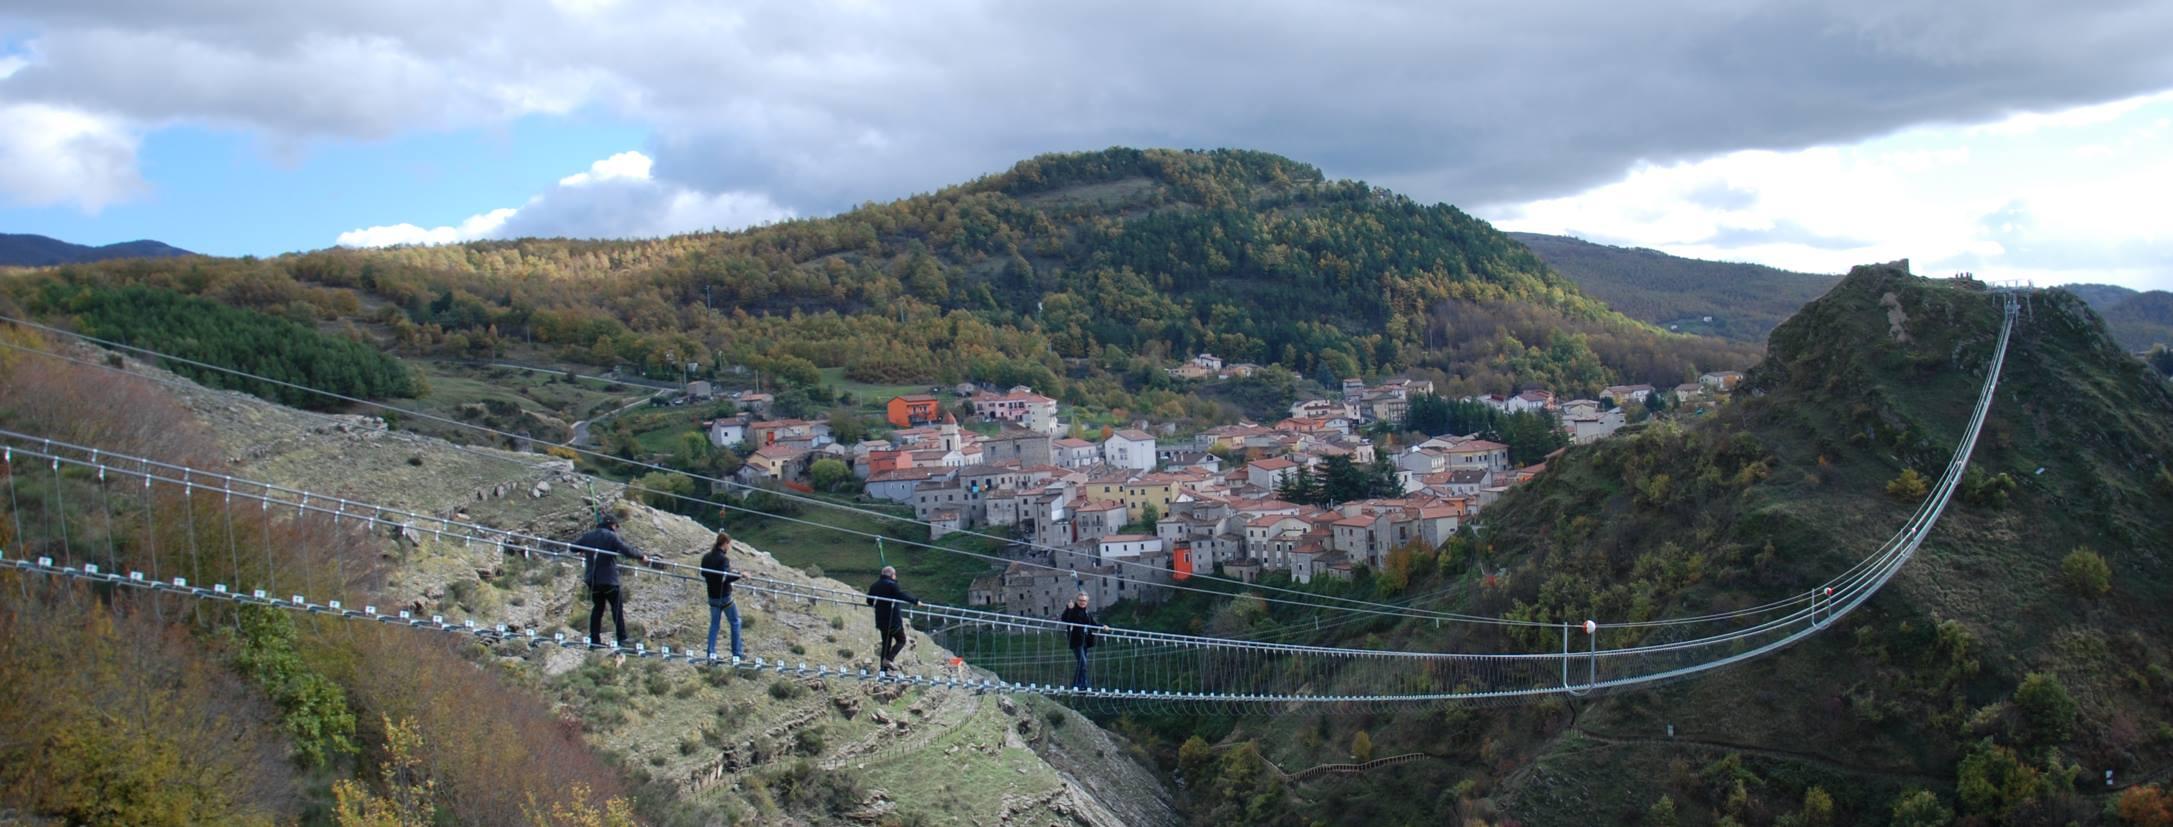 ponte tibetano sasso di castalda